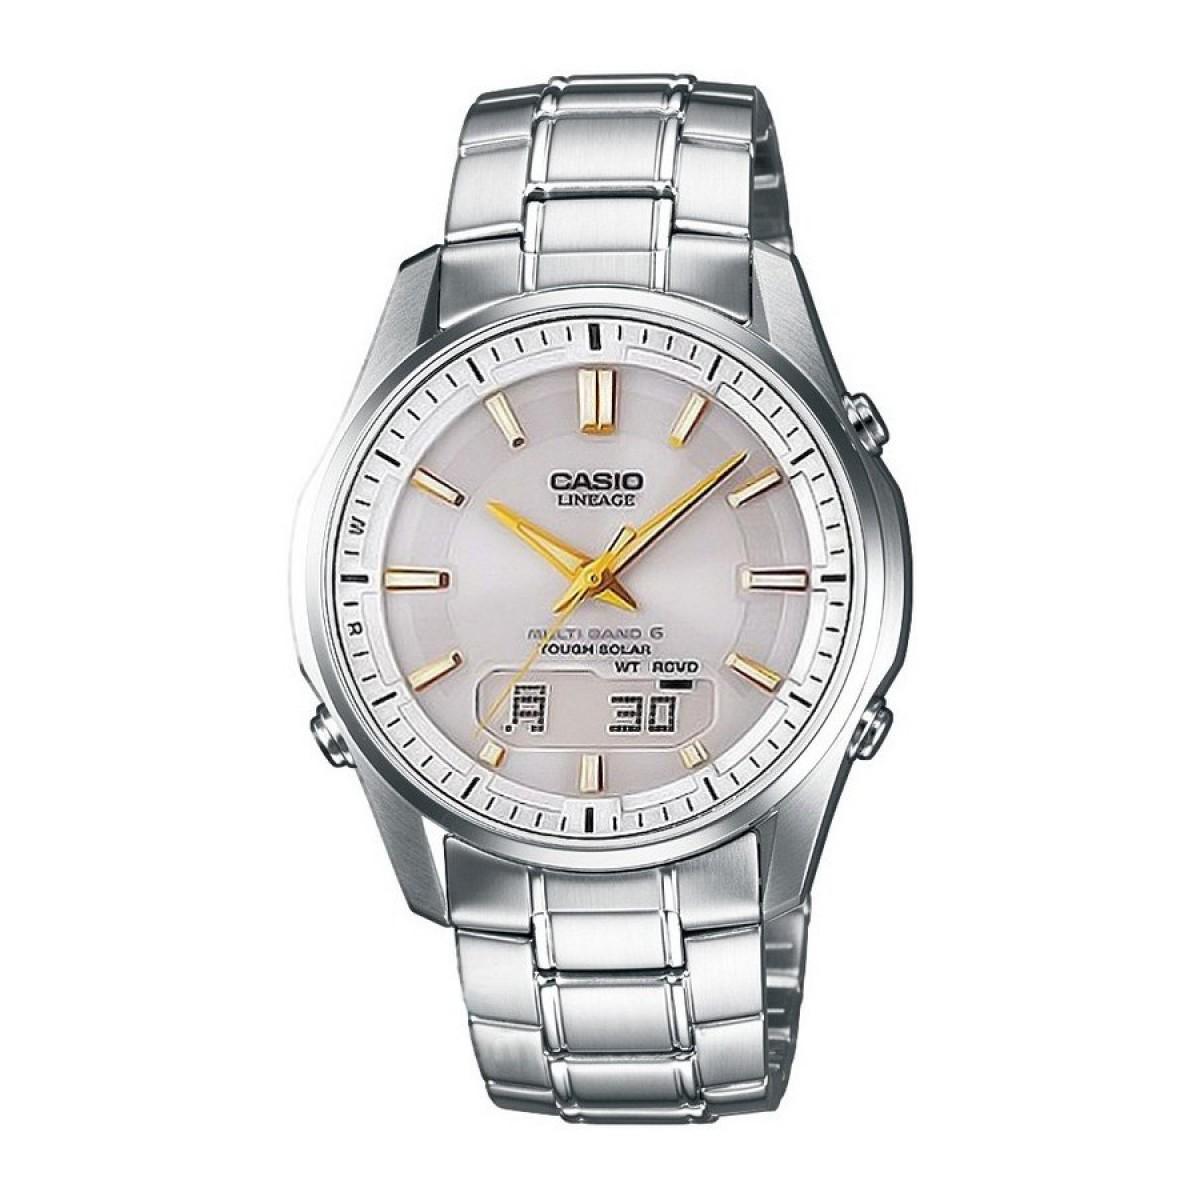 Часовник Casio LCW-M100DSE-7A2ER